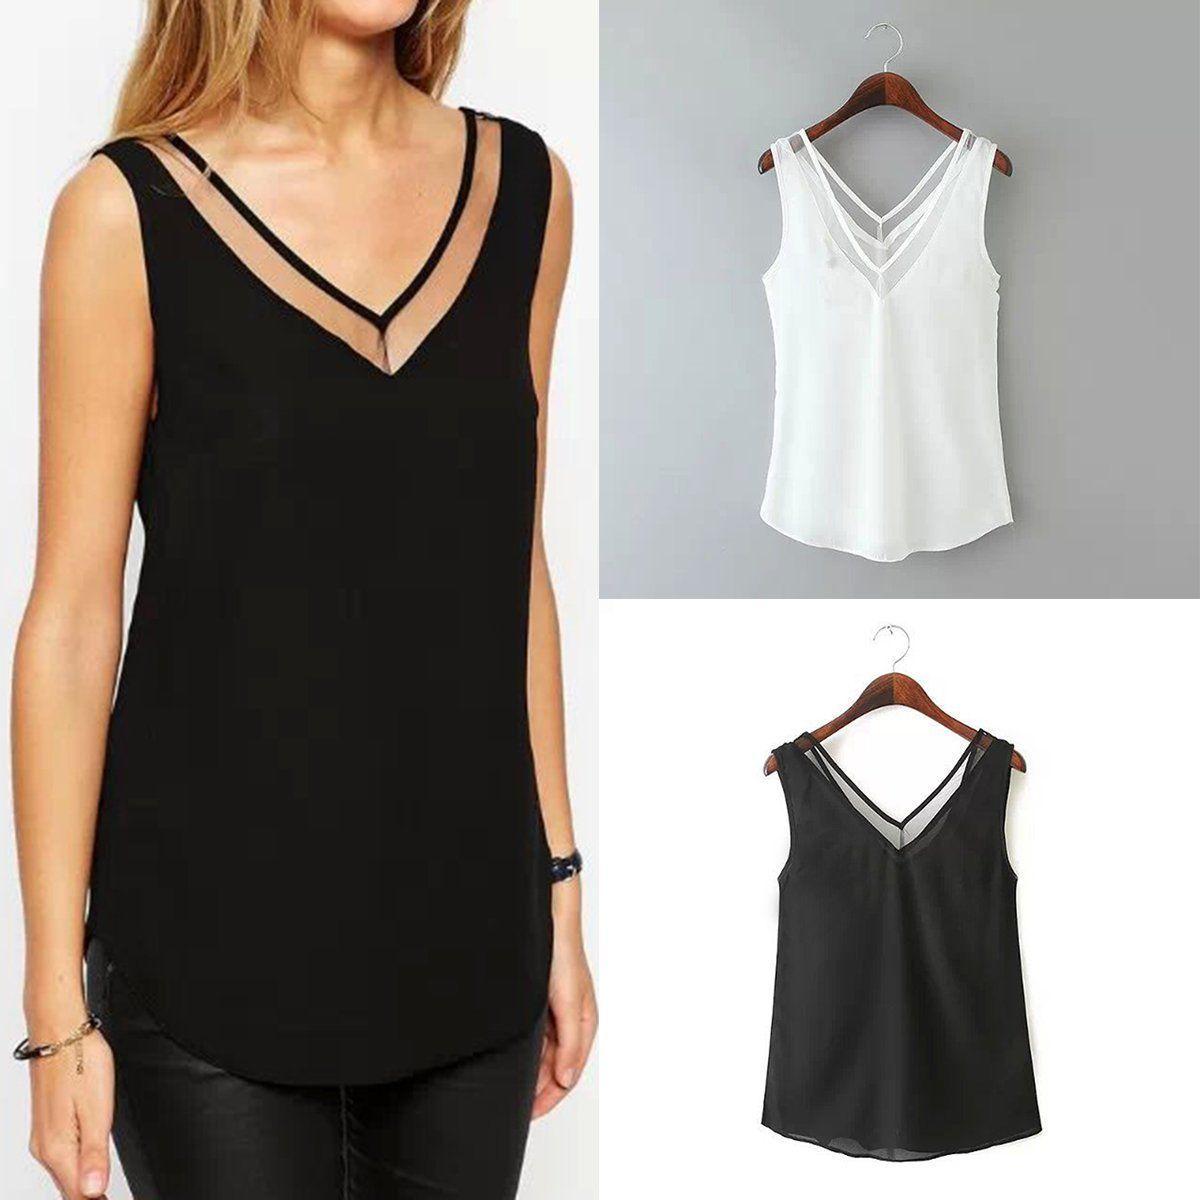 d631bb77d61 Women Summer Chiffon Sleeveless Shirt Loose Fashion Blouse Casual Tank Tops  Vest